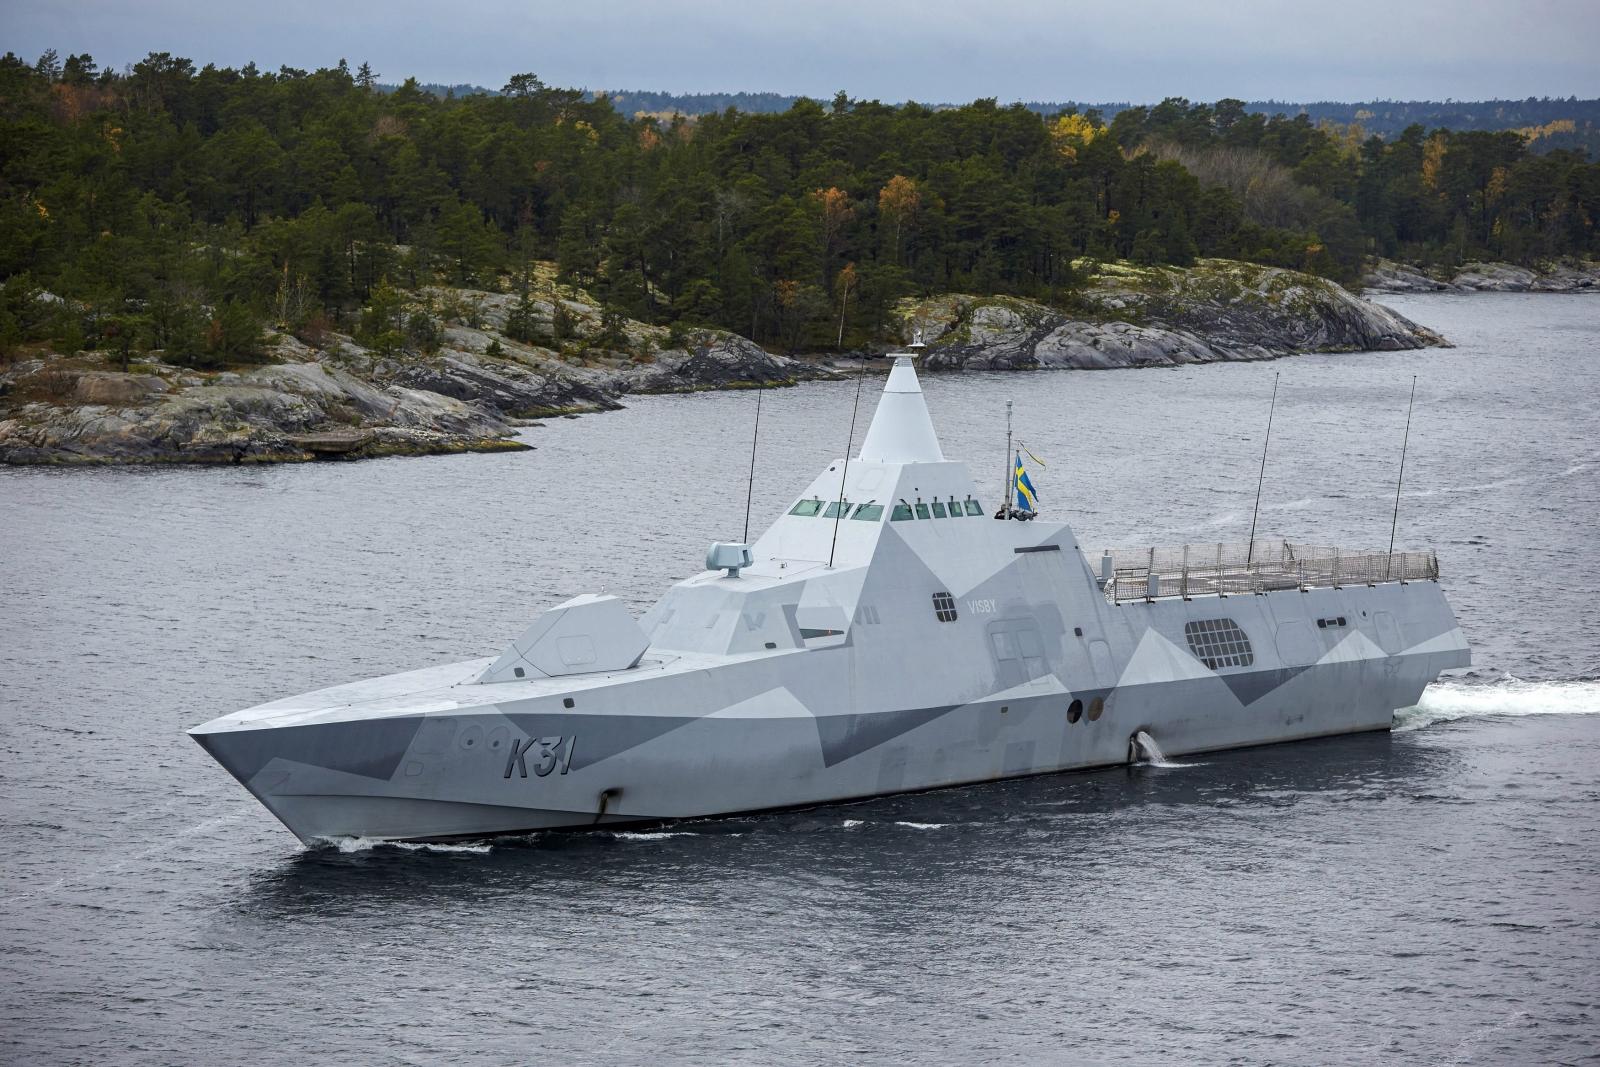 Swedish corvette HMS Visby patrols the Stockholm Archipelago